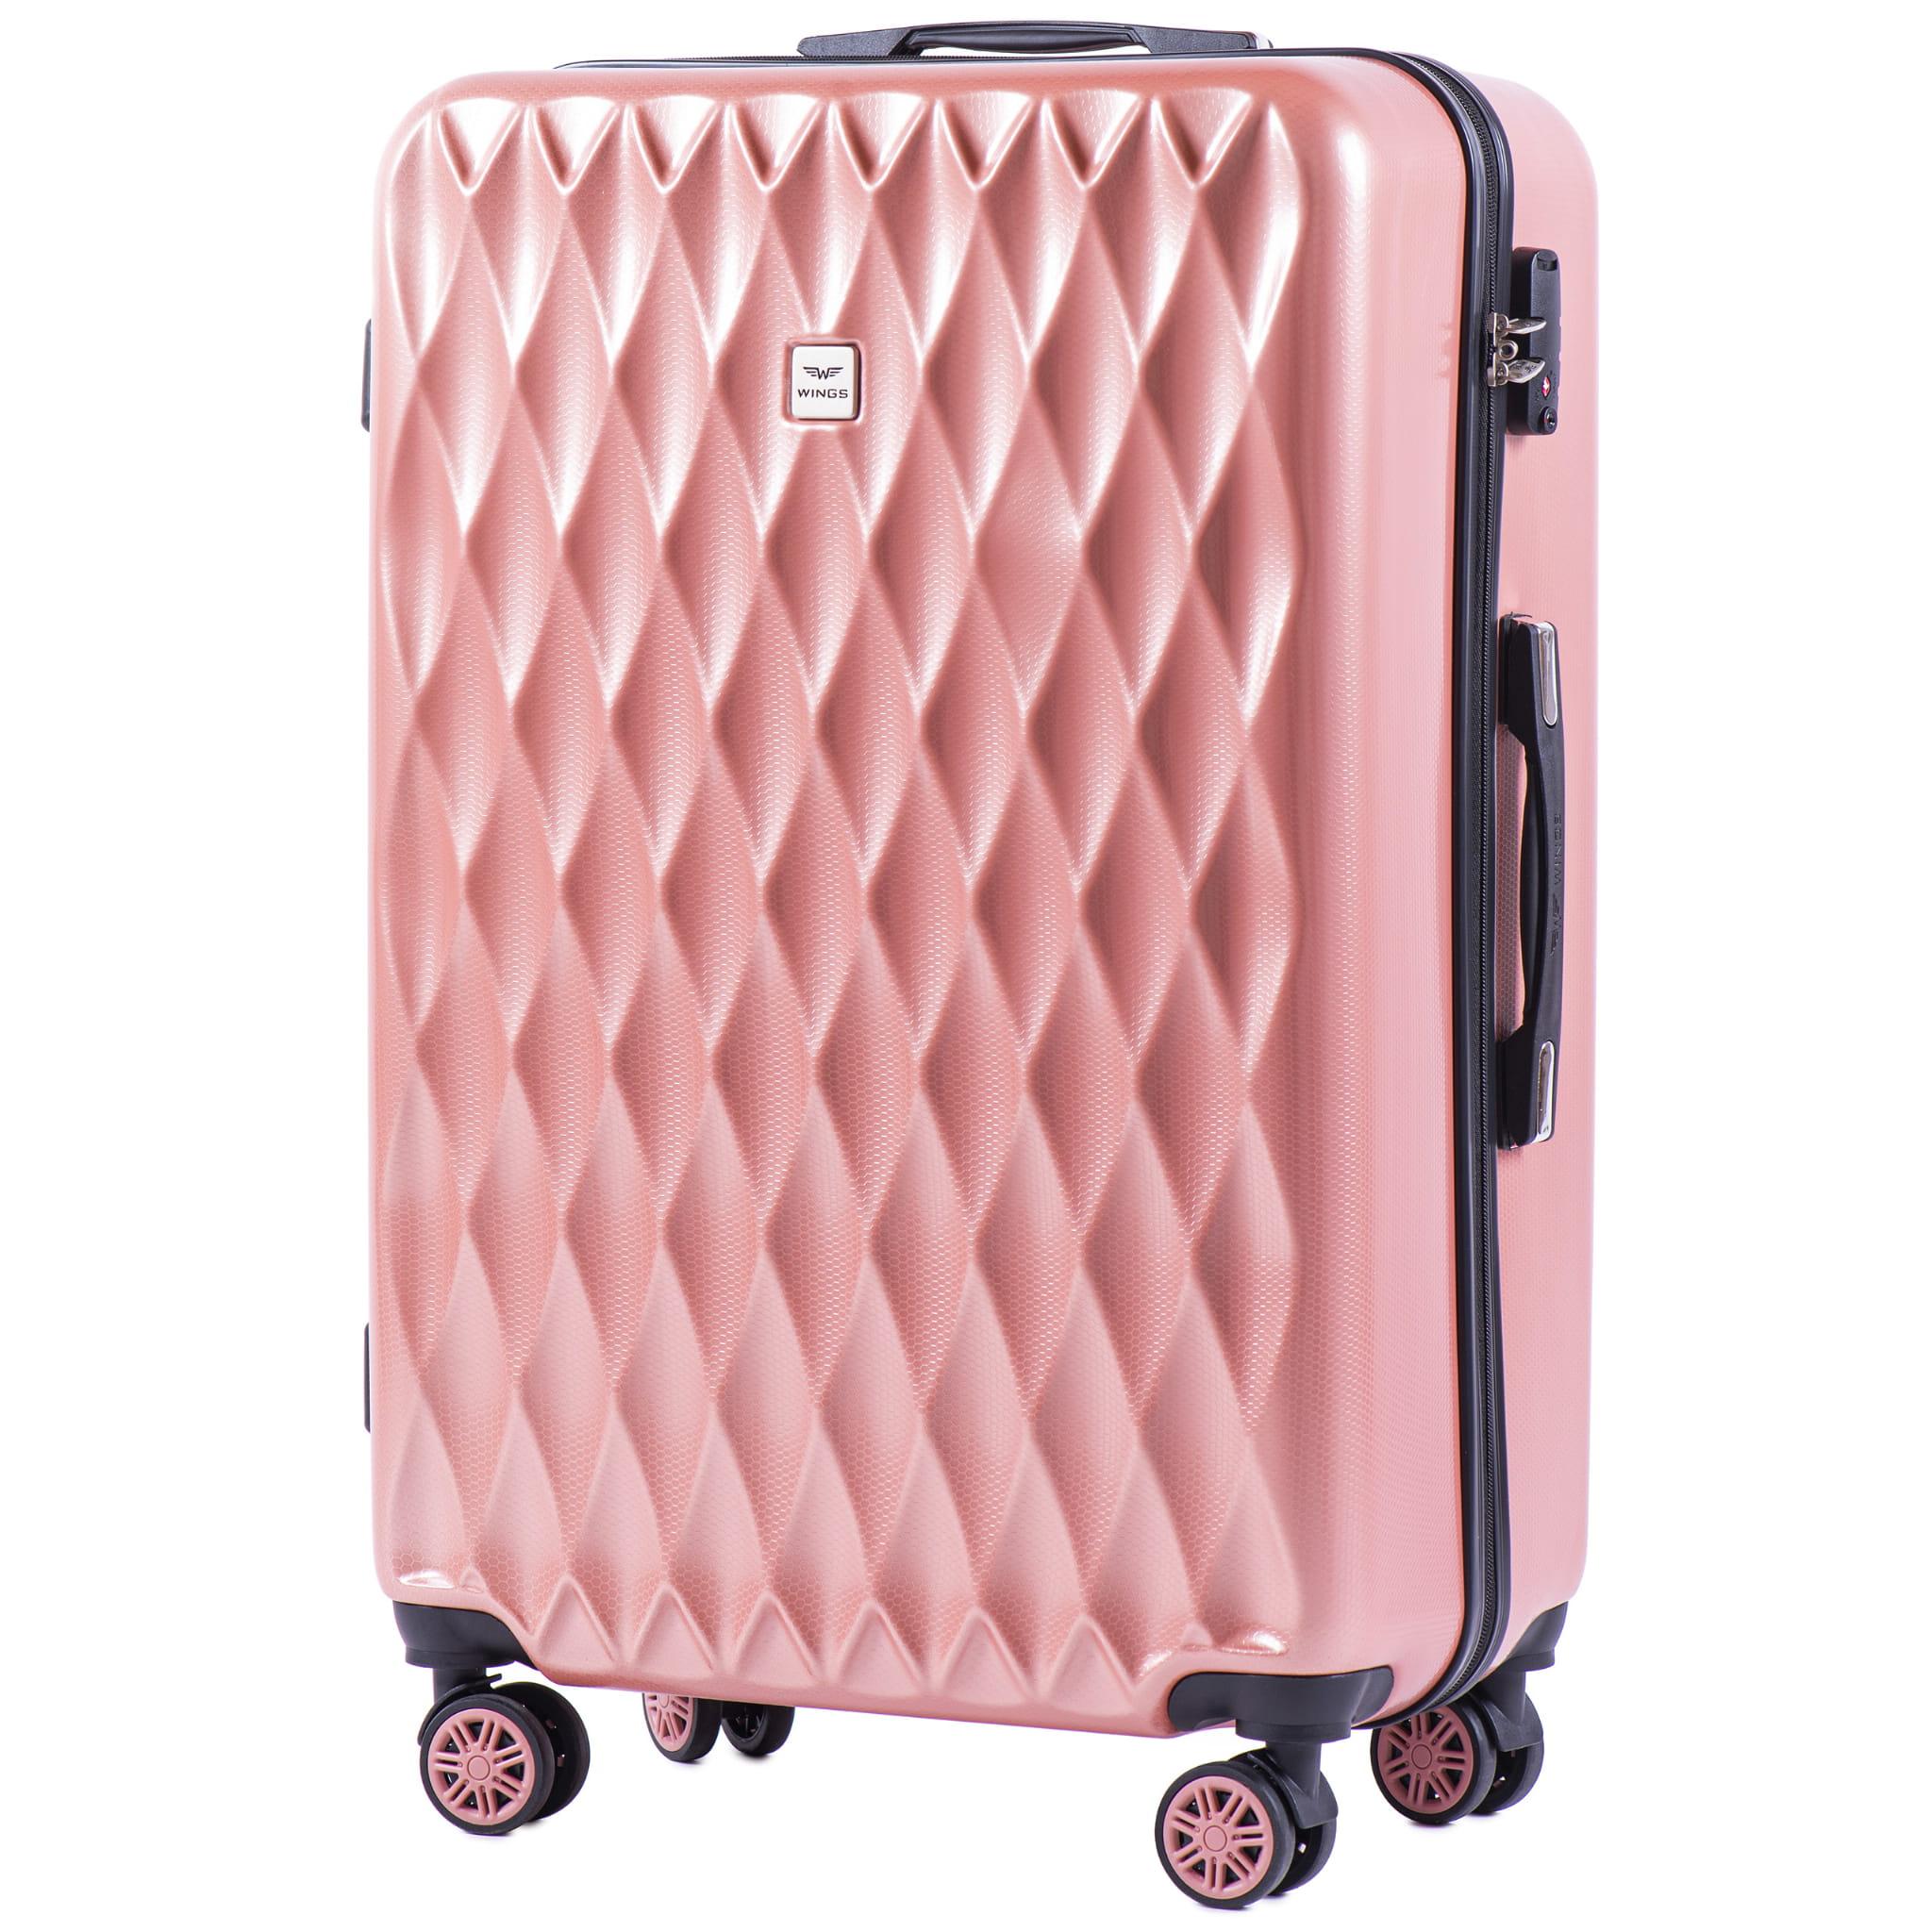 БОЛЬШОЙ ЧЕМОДАН WINGS PC190 L PINK  PREMIUM НА 4-Х КАУЧУКОВЫХ КОЛЕСАХ! Для багажа ,до 23 кг!